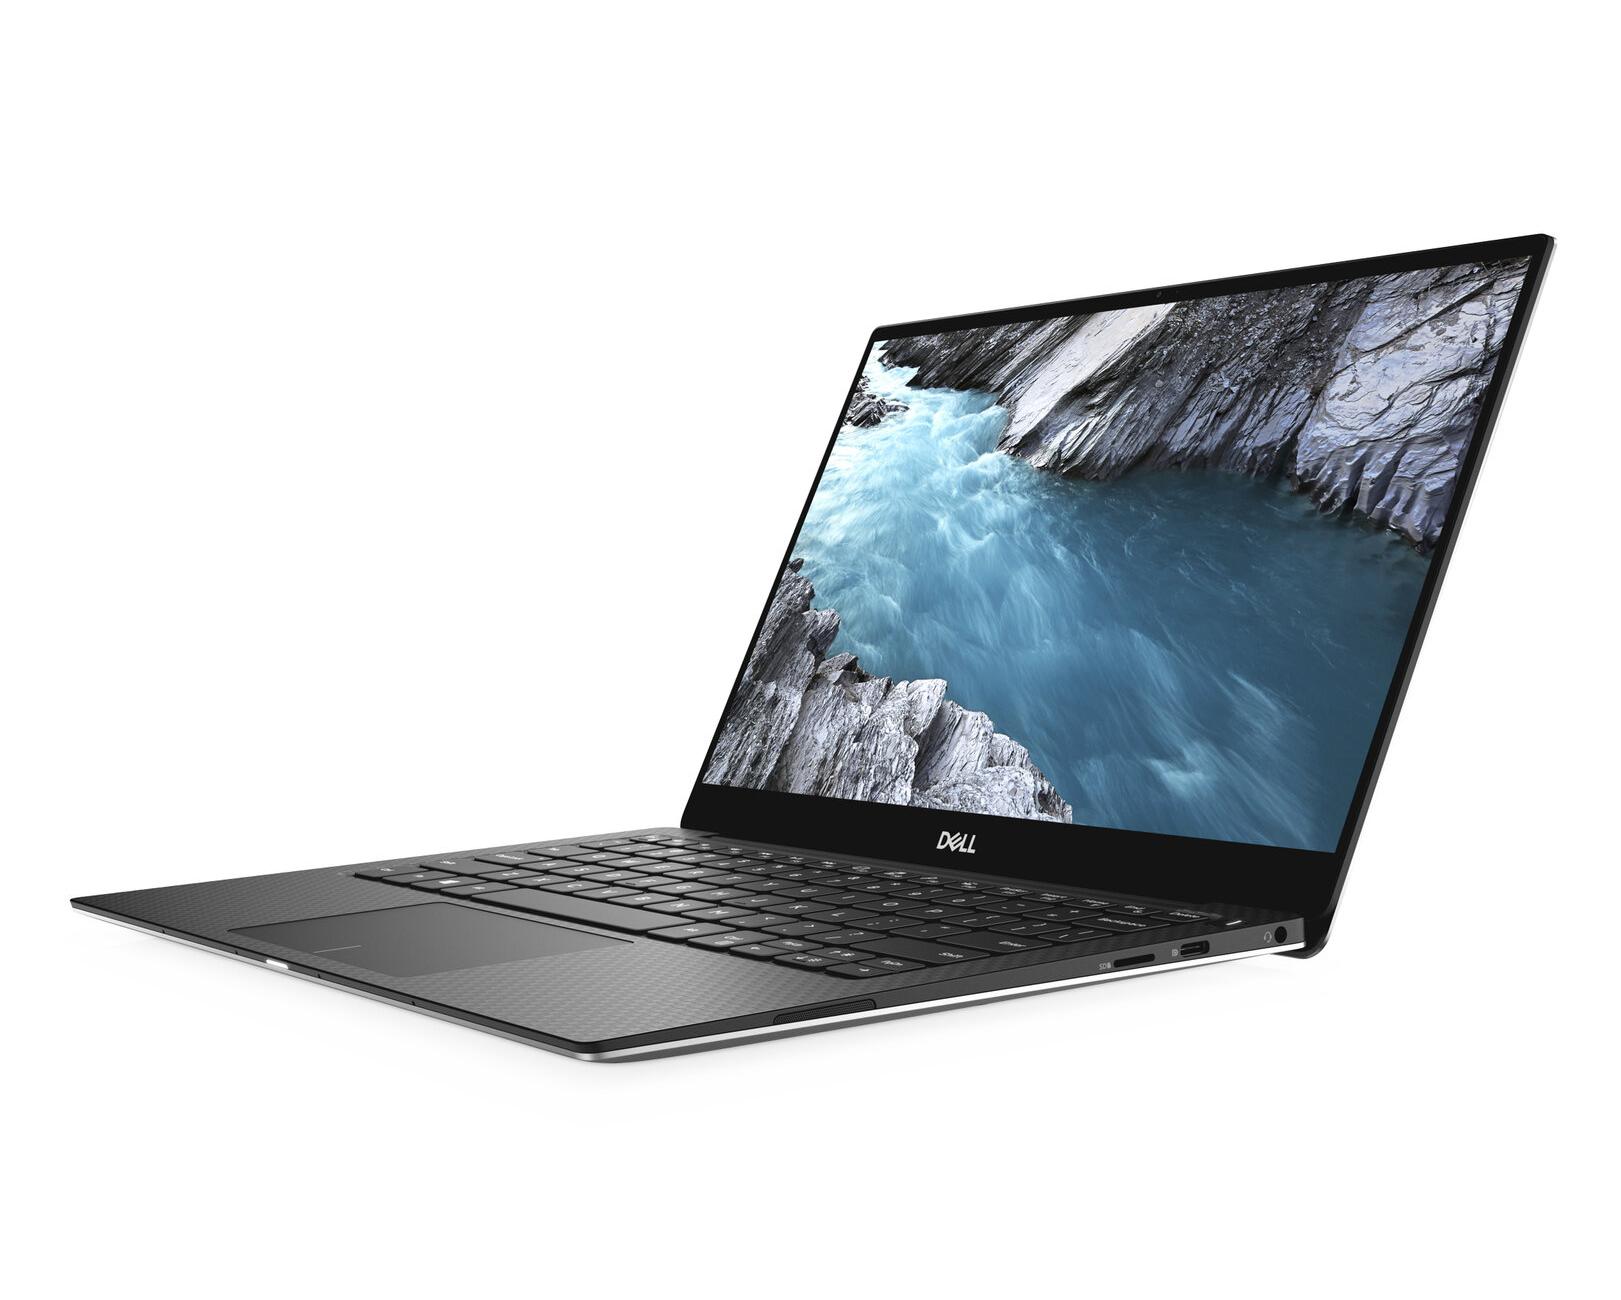 Dell XPS 13 9380 2019 (i5-8265U, 256GB, UHD) Subnotebook Review